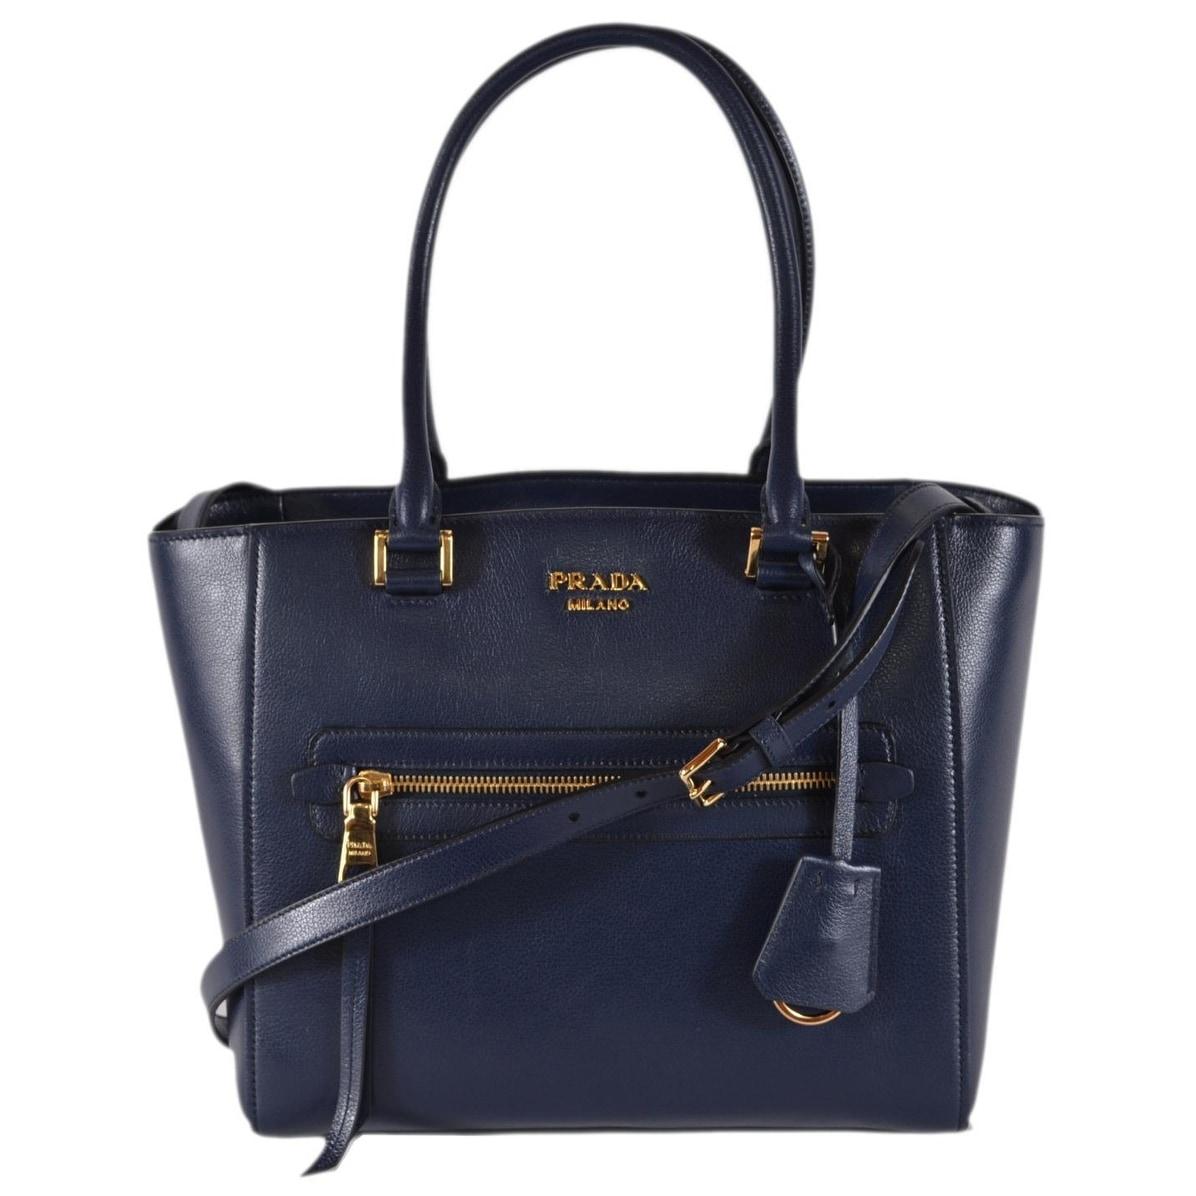 1534cb88bea Shop Prada 1BG227 Baltic Blue Glace Leather Medium Convertible Purse  Handbag Tote - Free Shipping Today - Overstock.com - 26443705